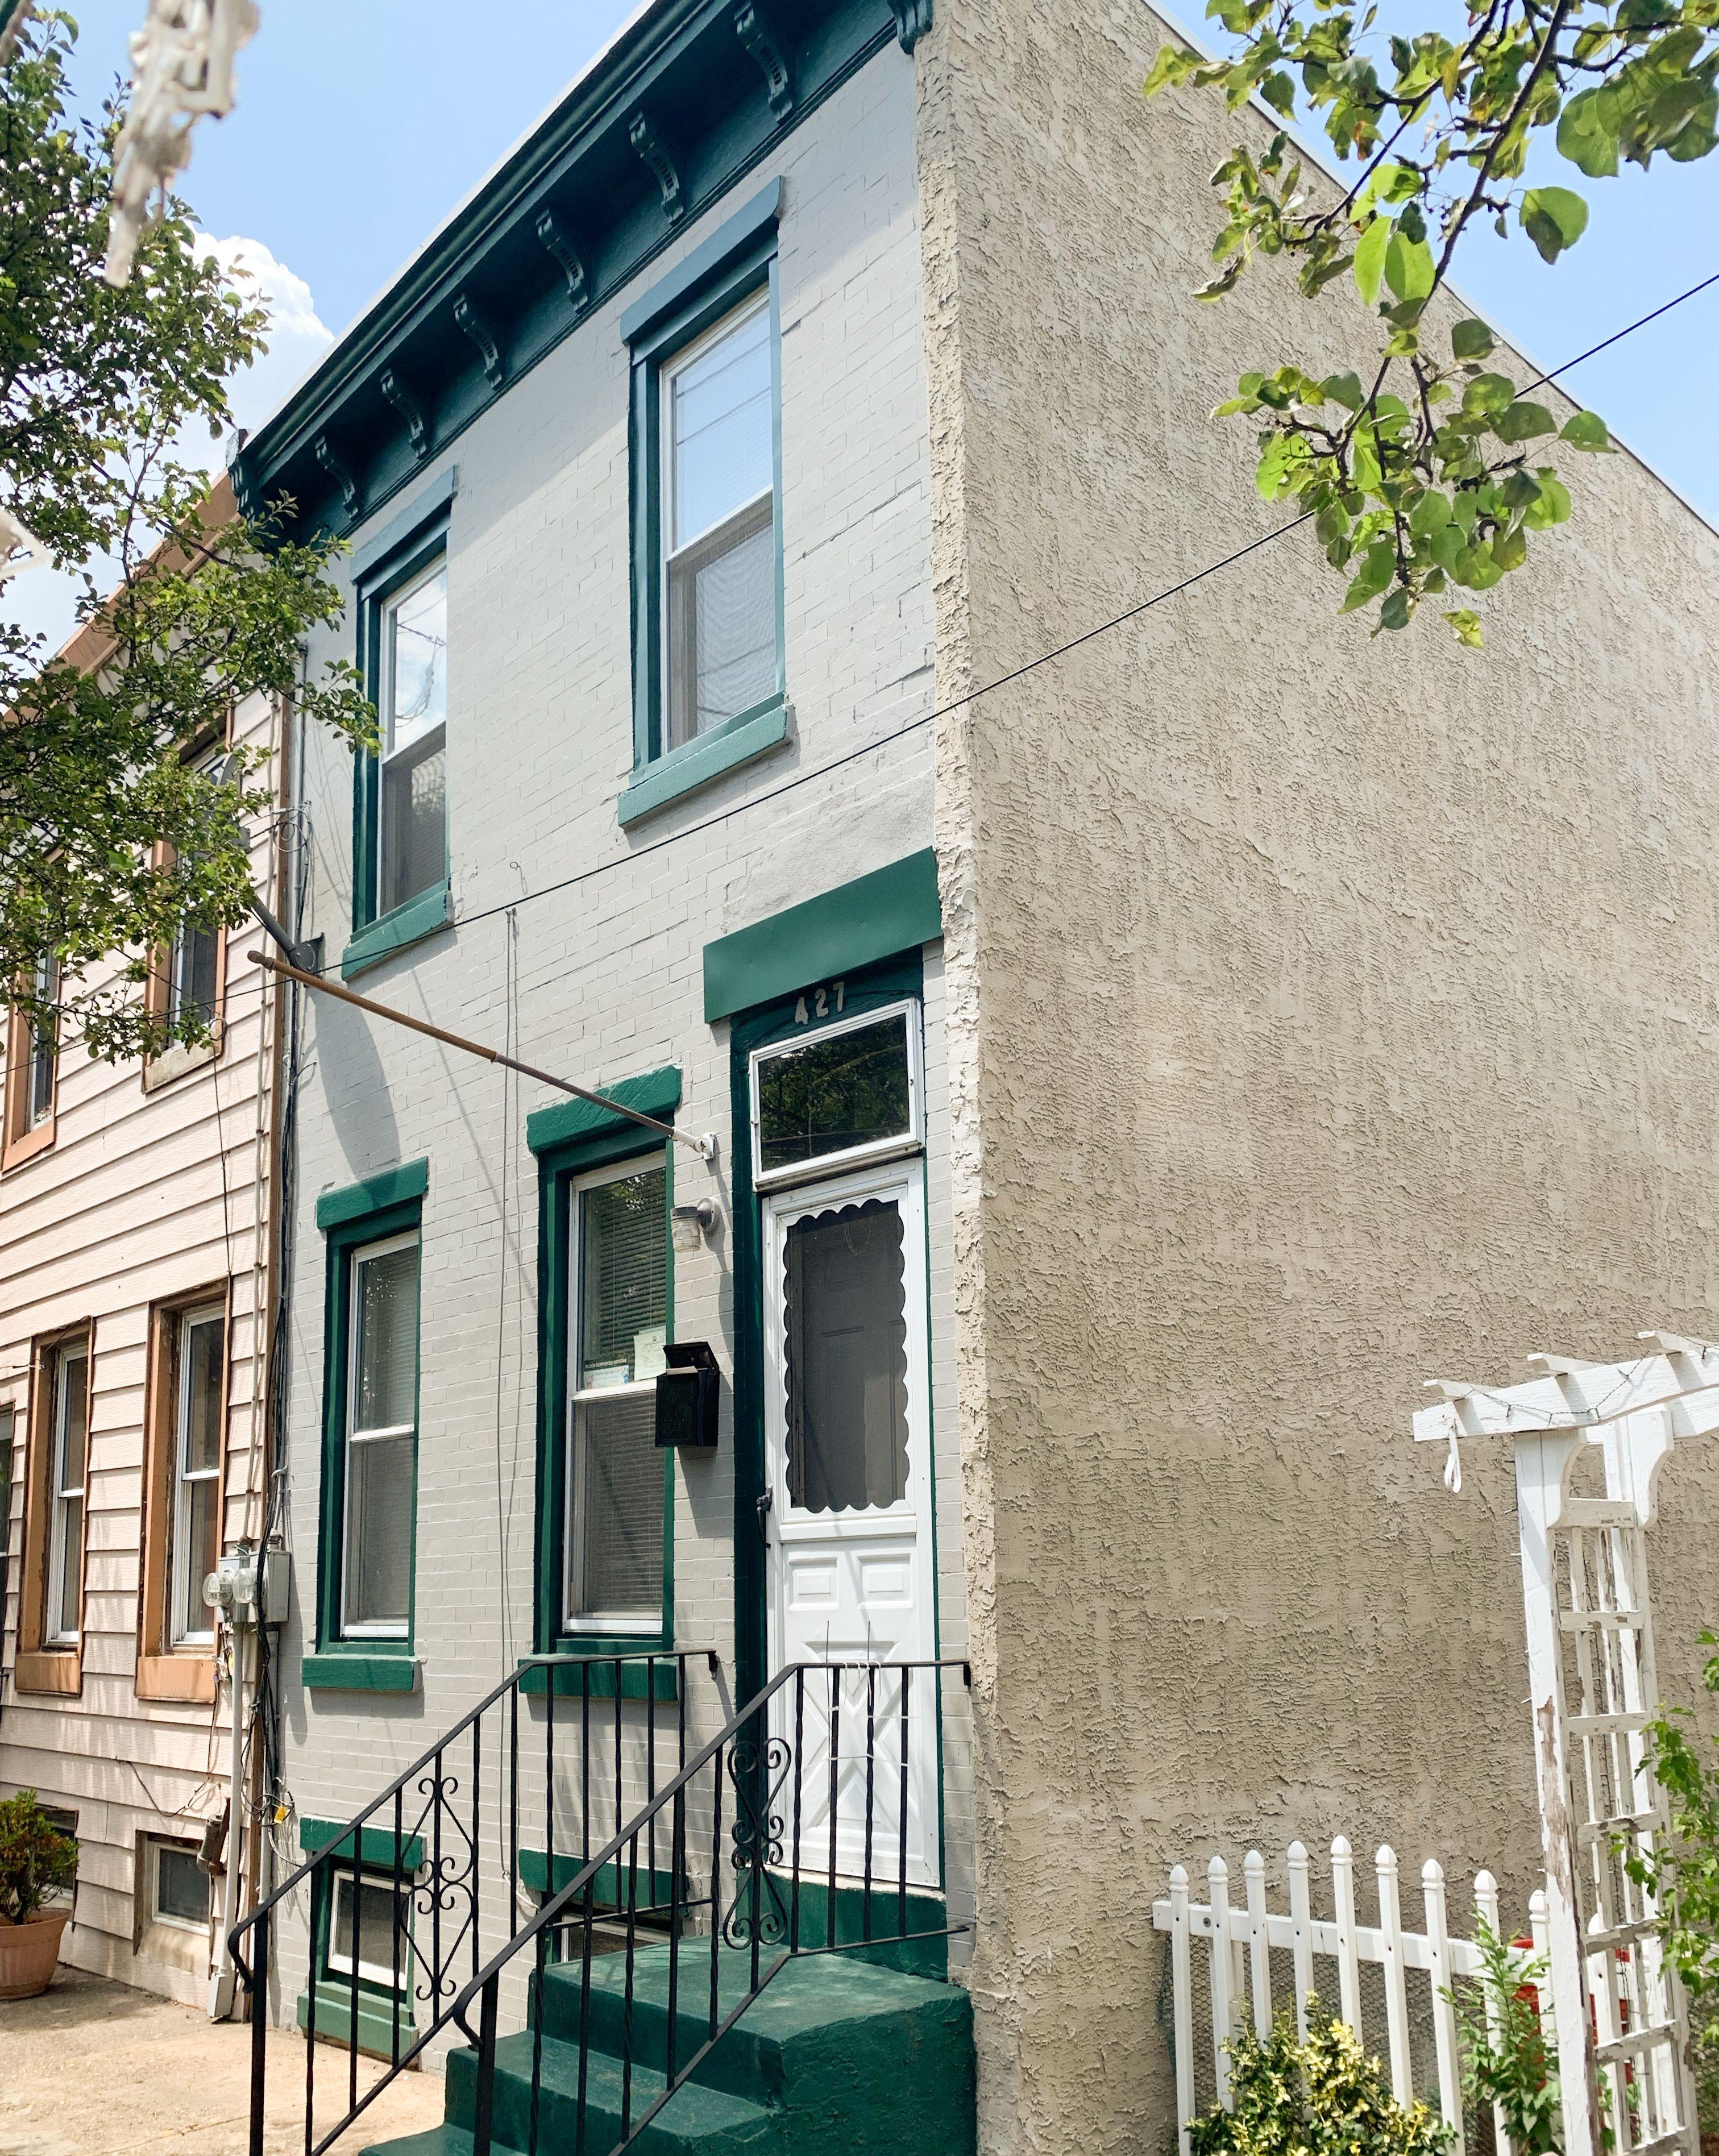 427 Royden St, Camden, NJ